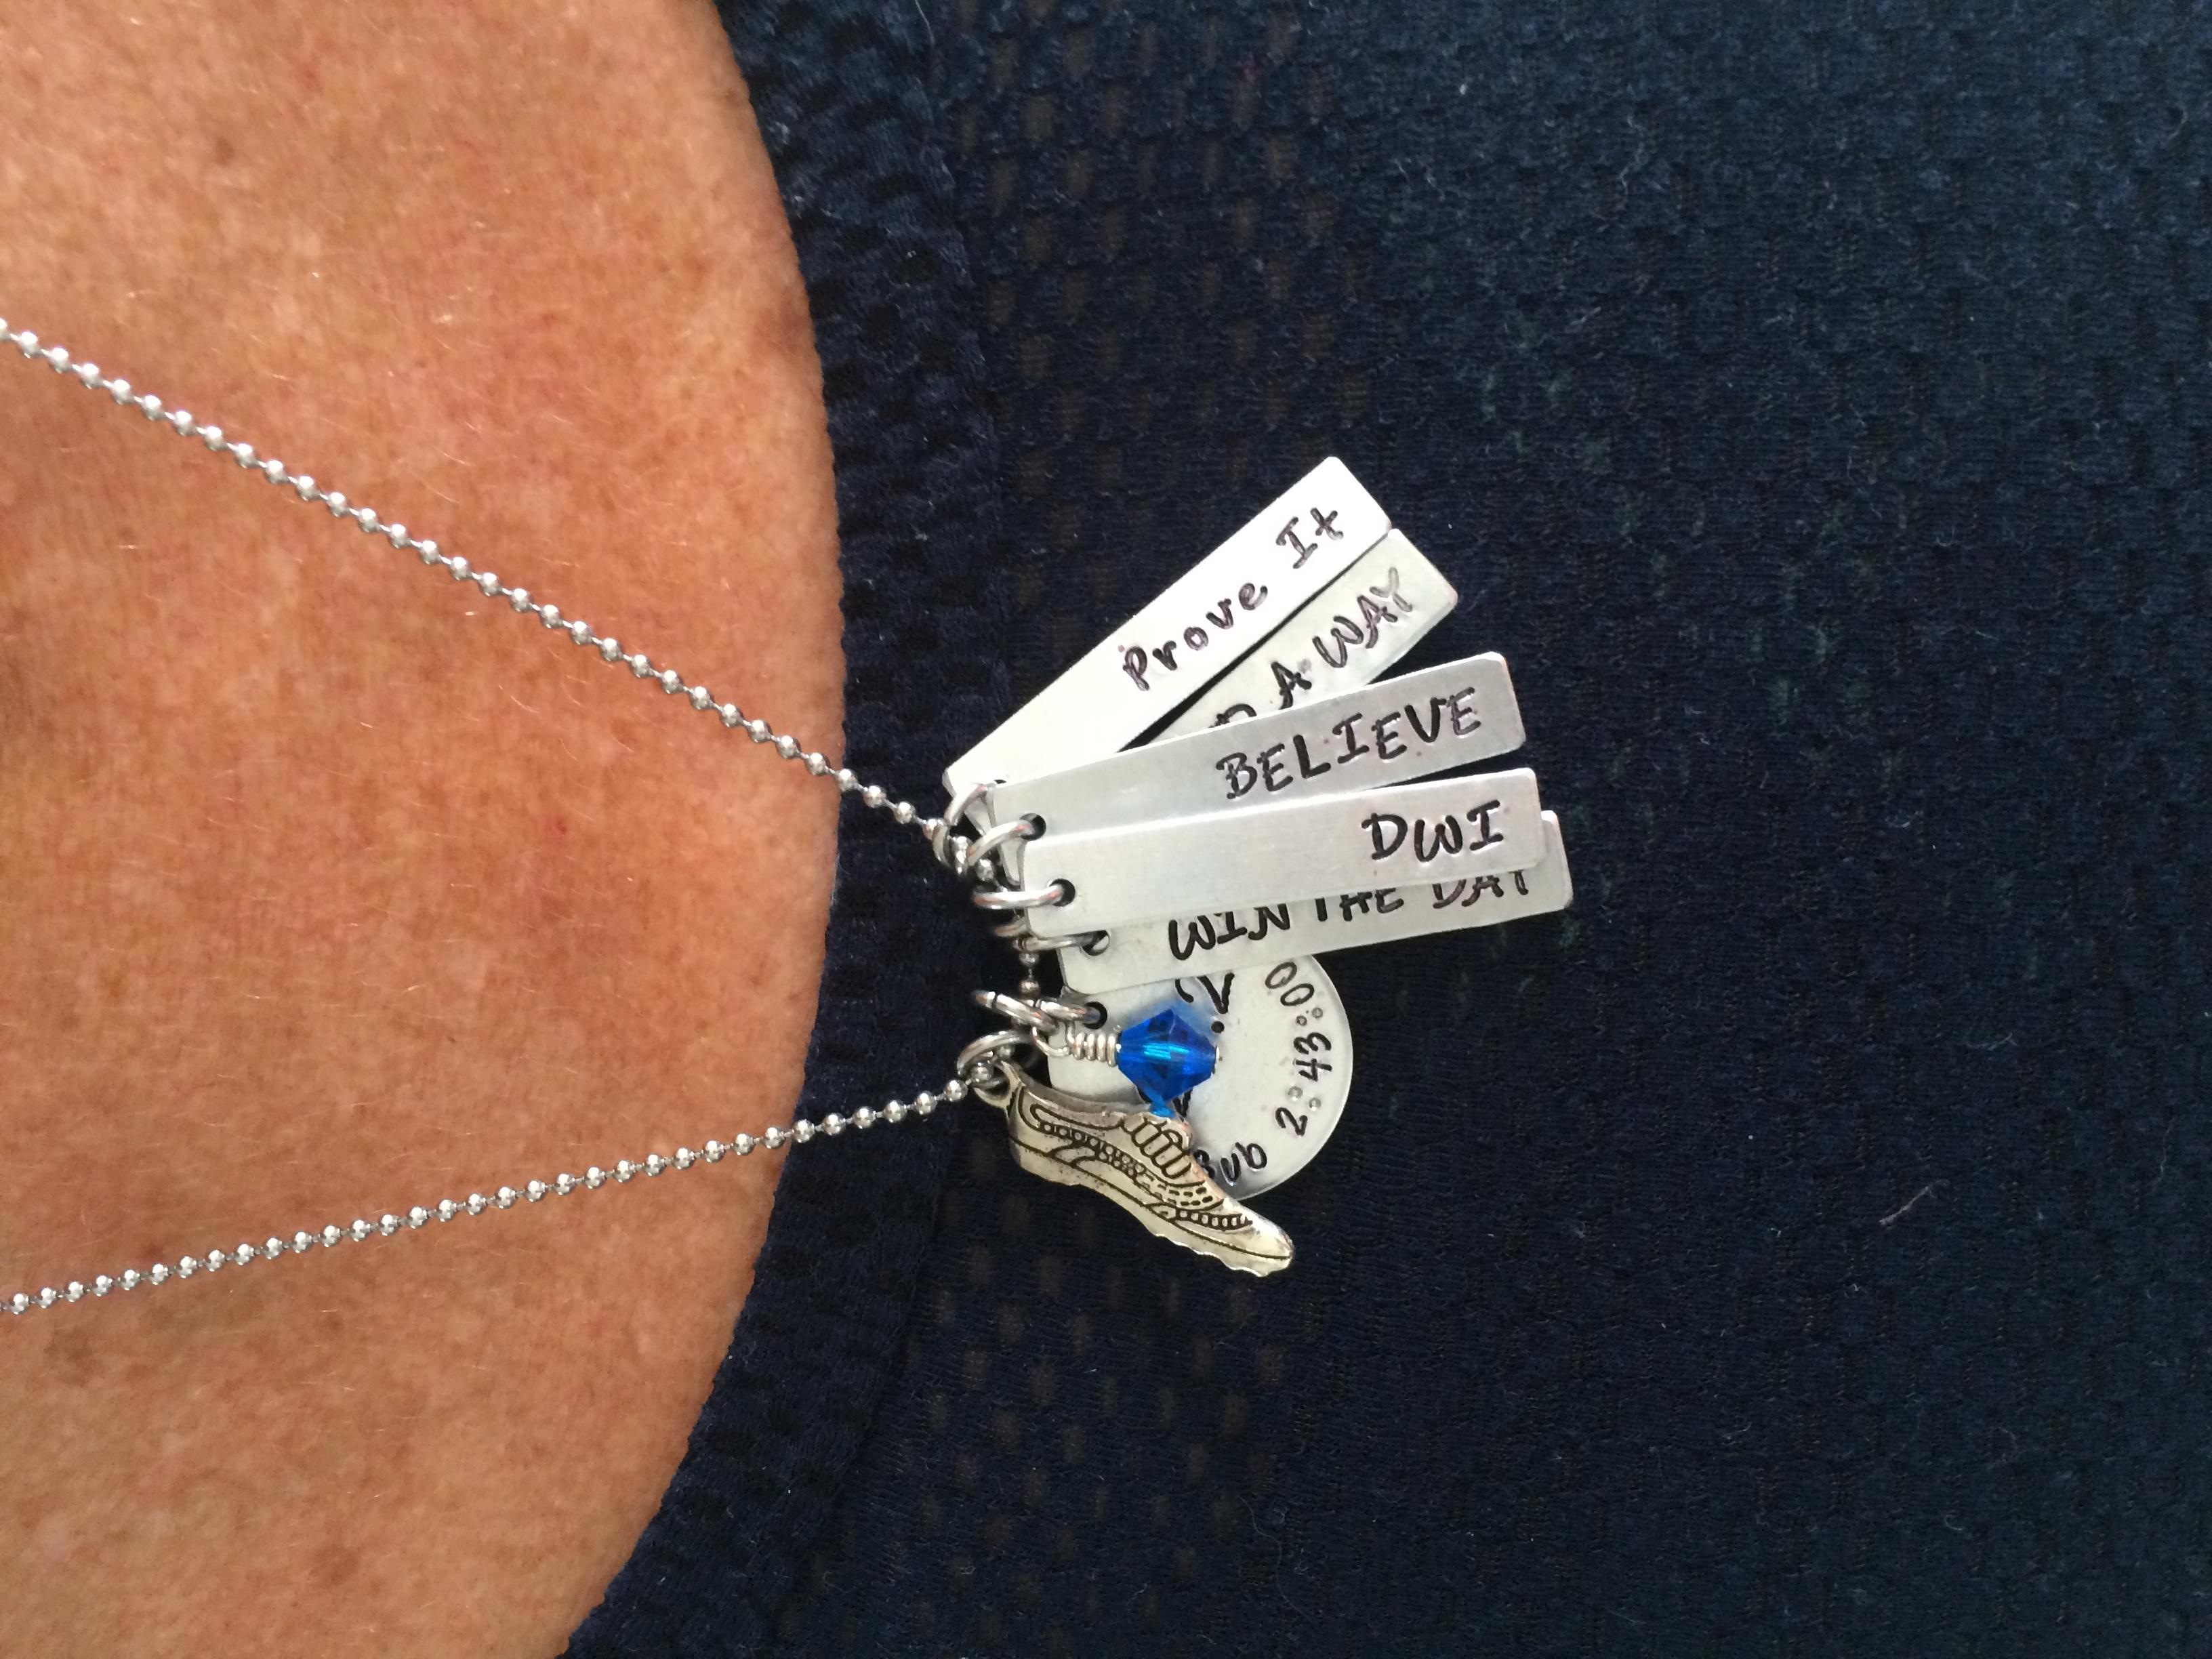 My believe necklace